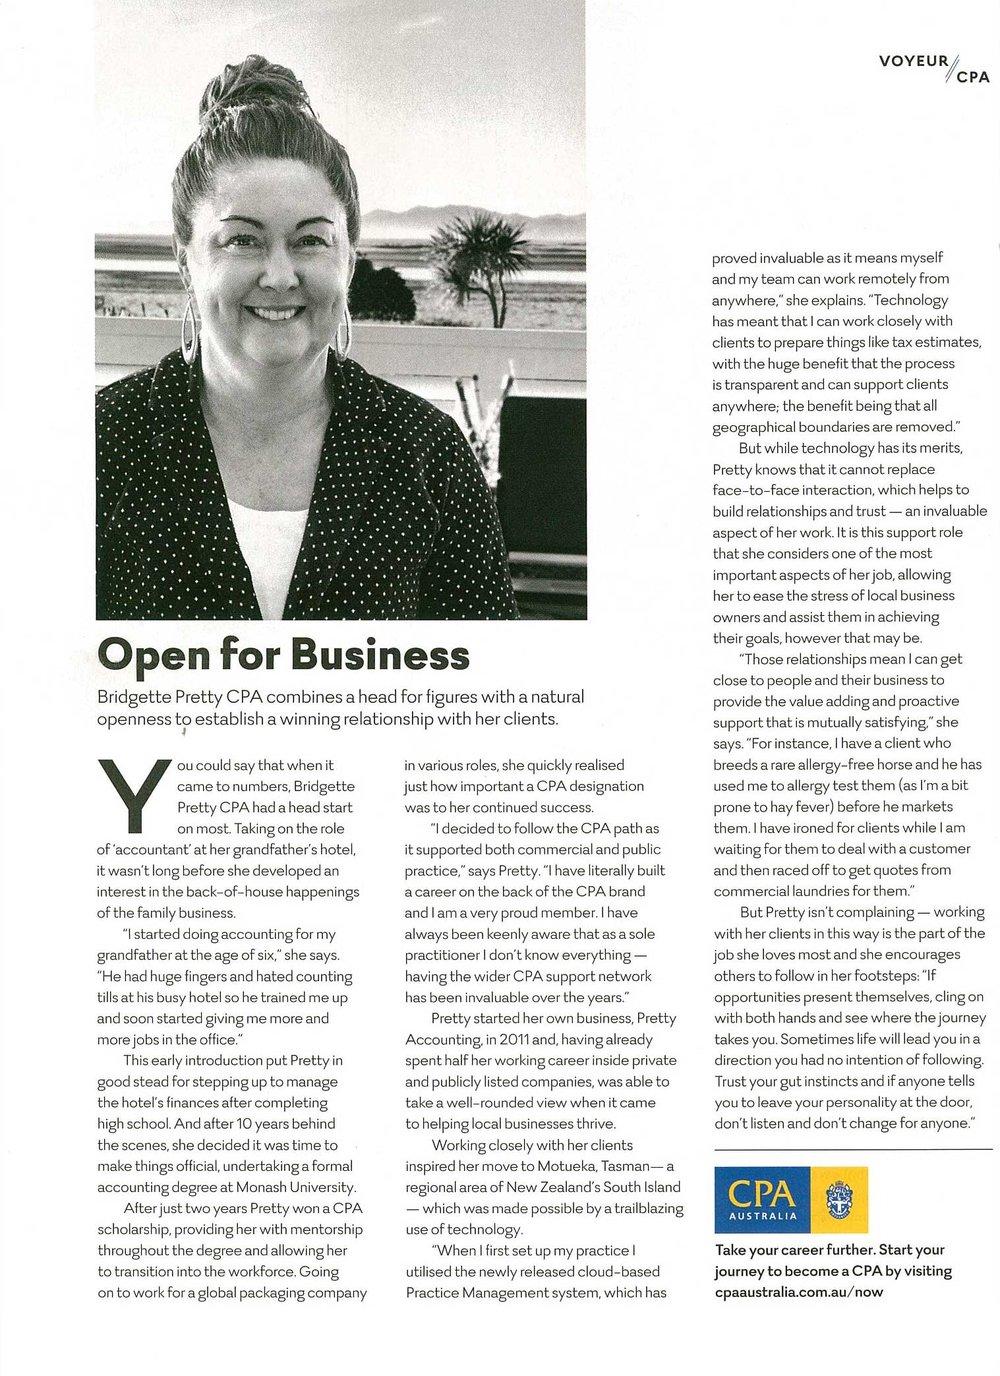 Virgin-Australia-Voyeur-Magazine-August-2018.jpg